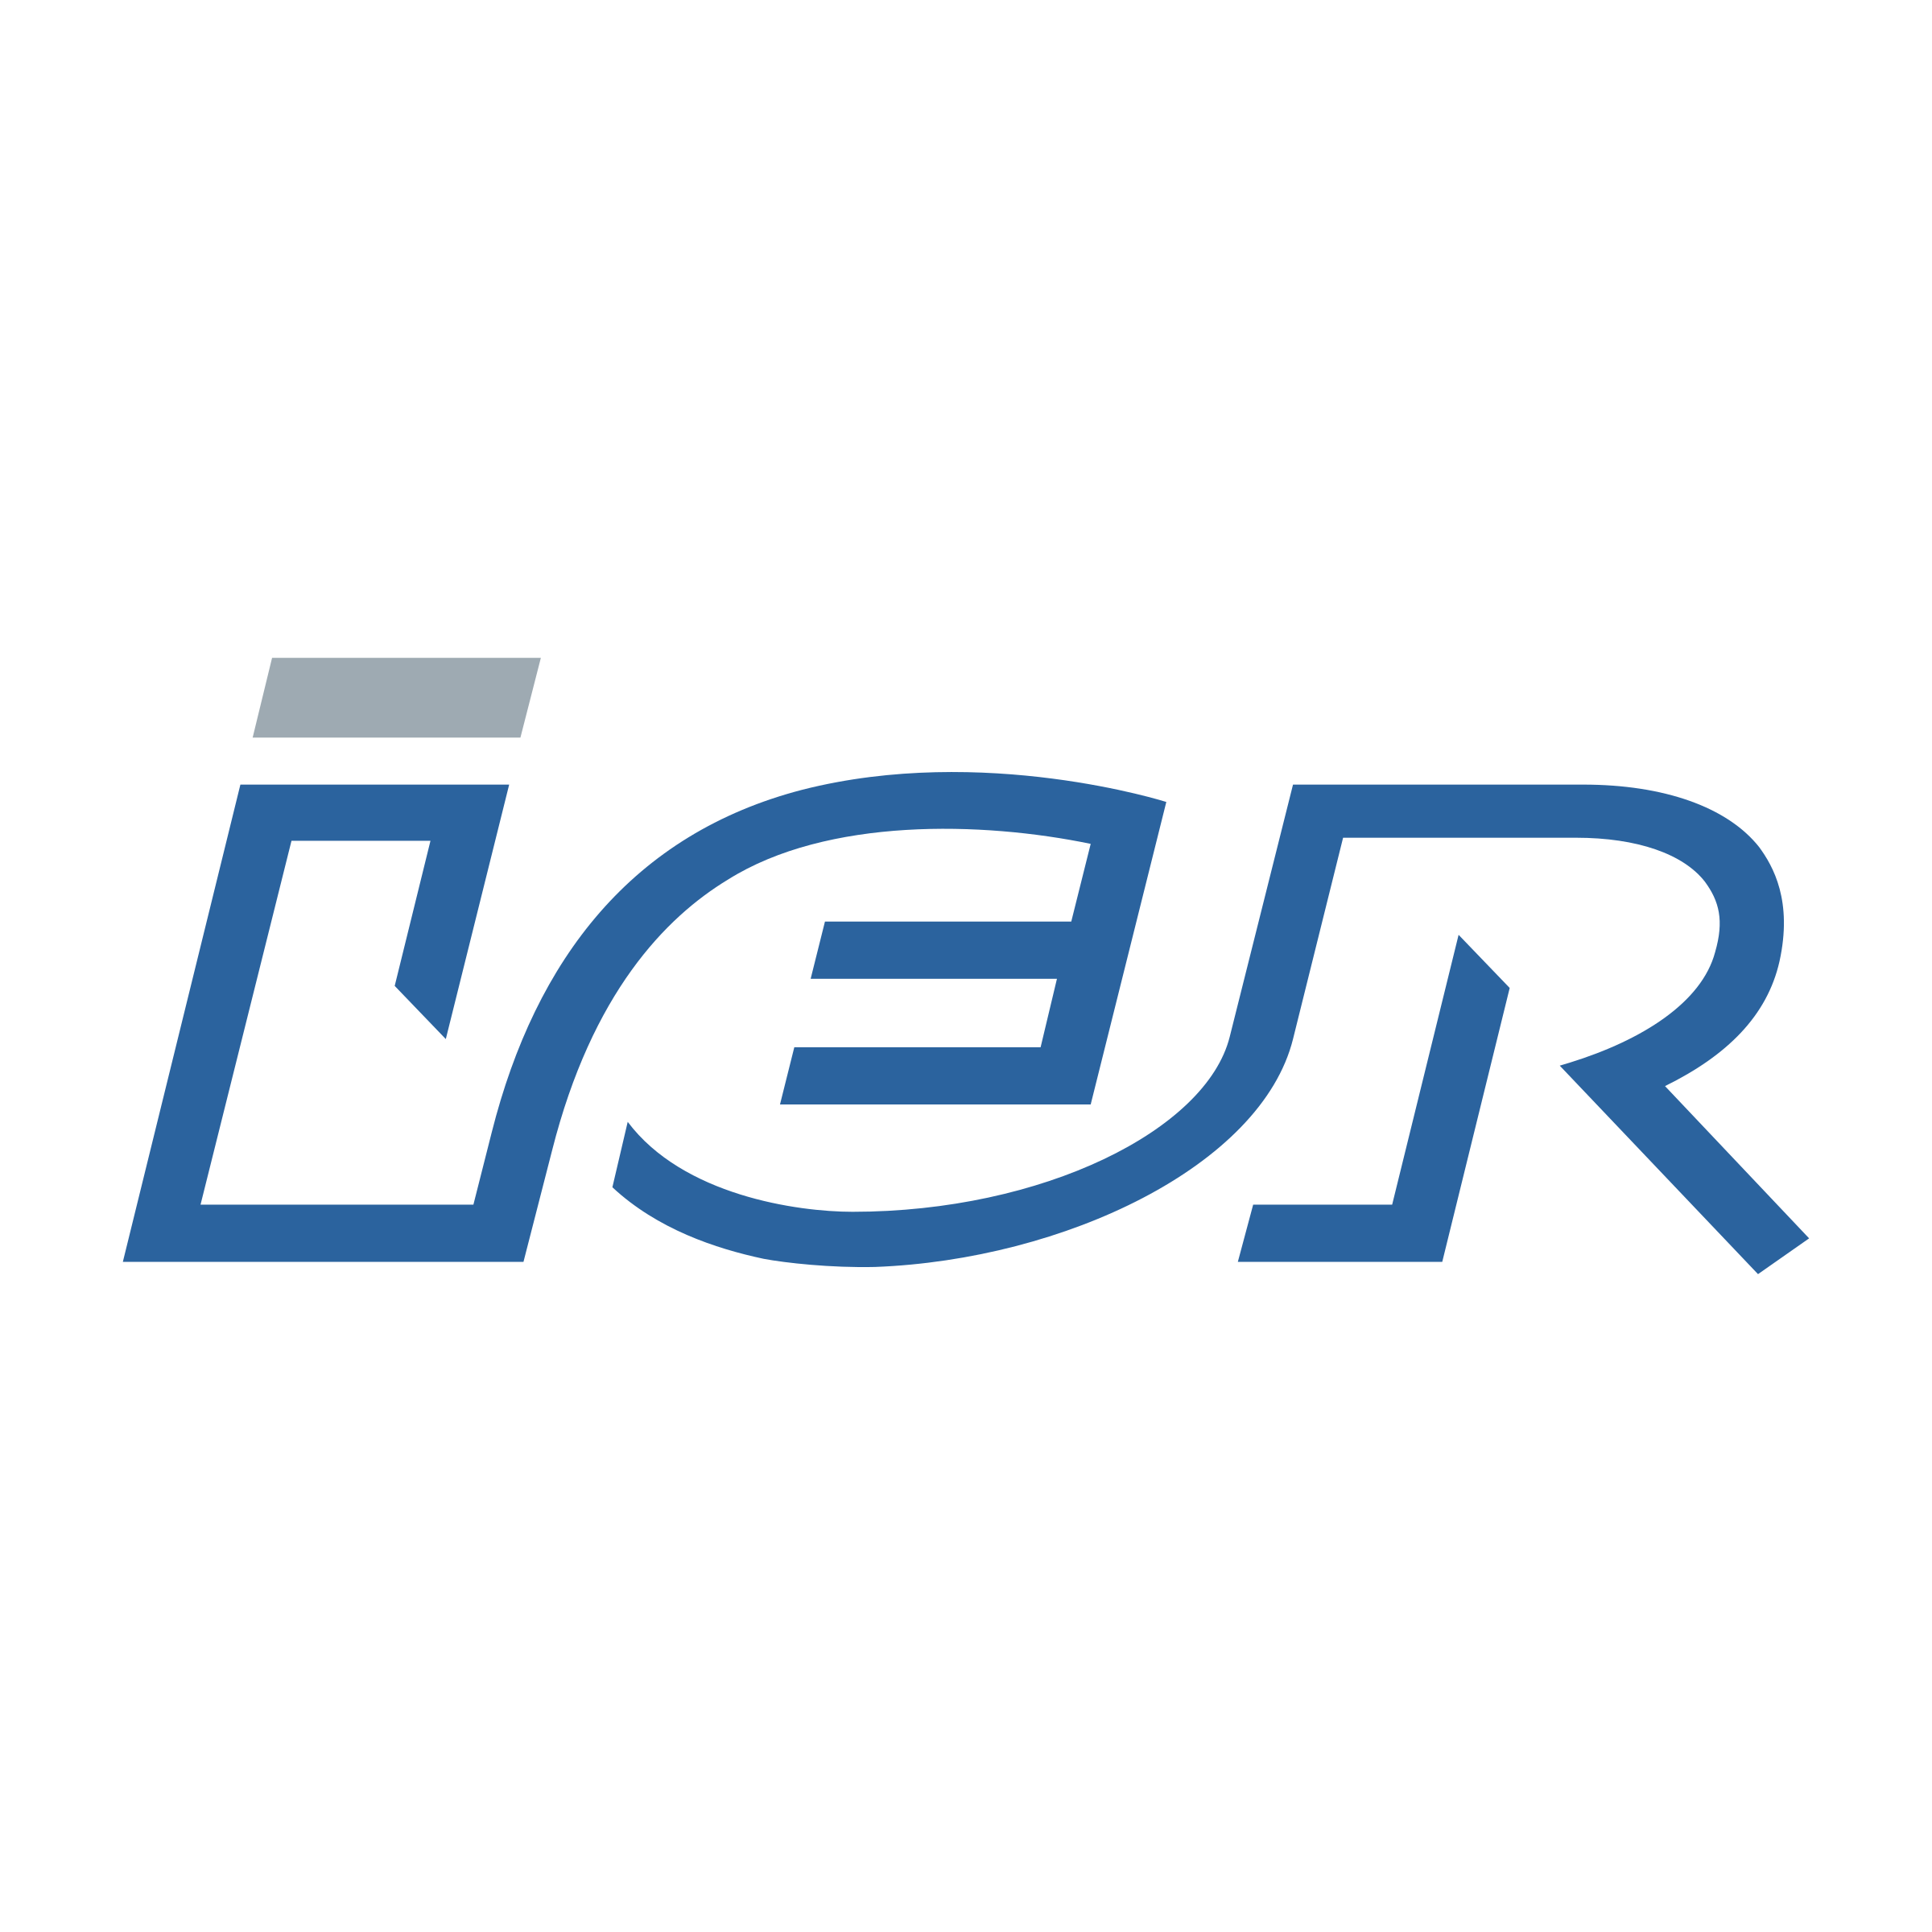 IER Logo PNG Transparent & SVG Vector - Freebie Supply